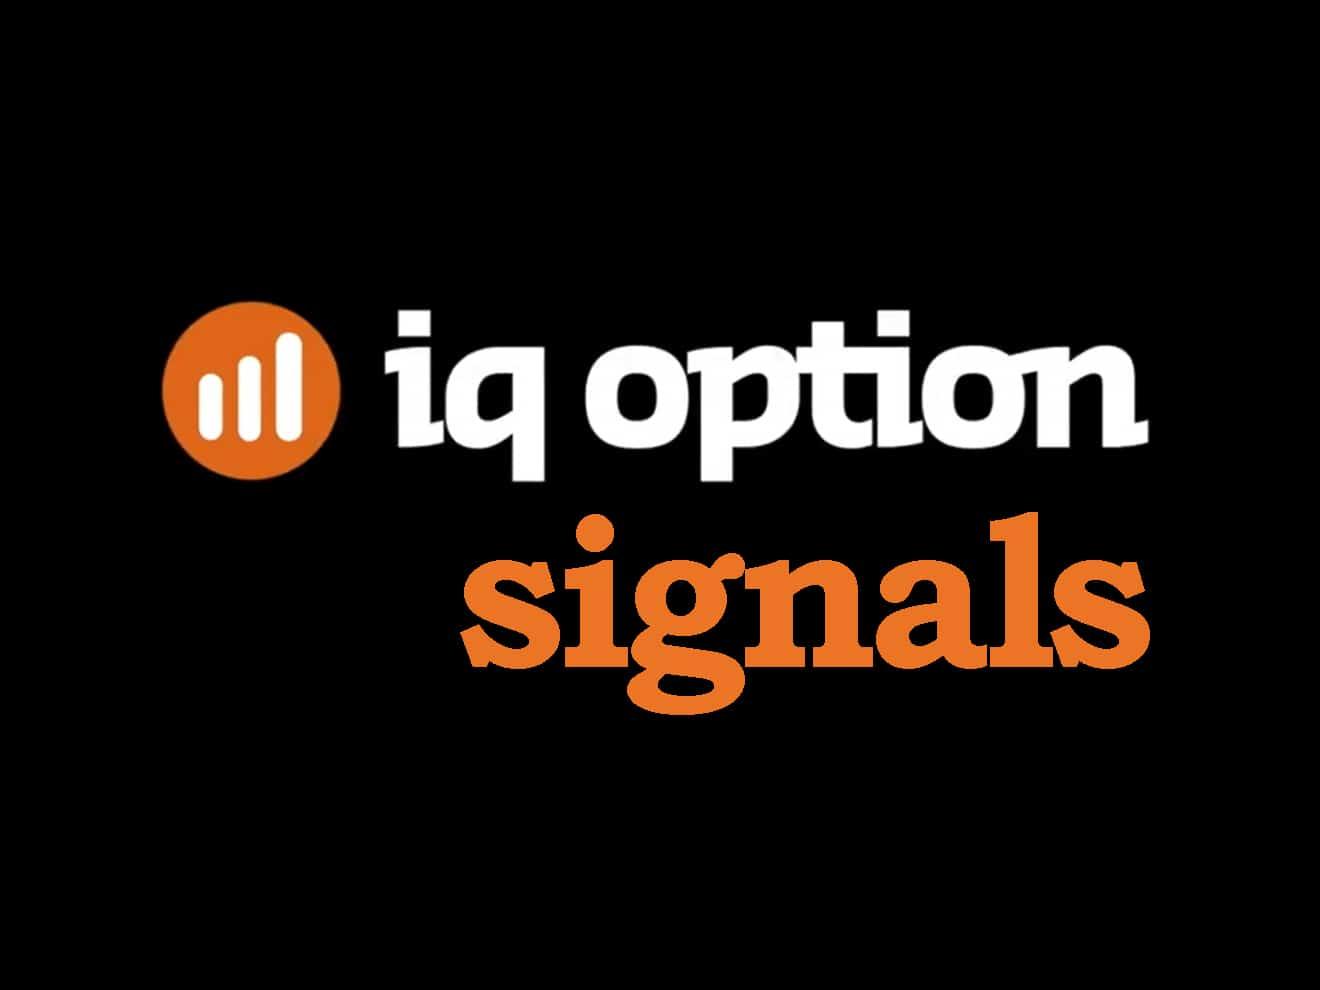 Ifollow binary options